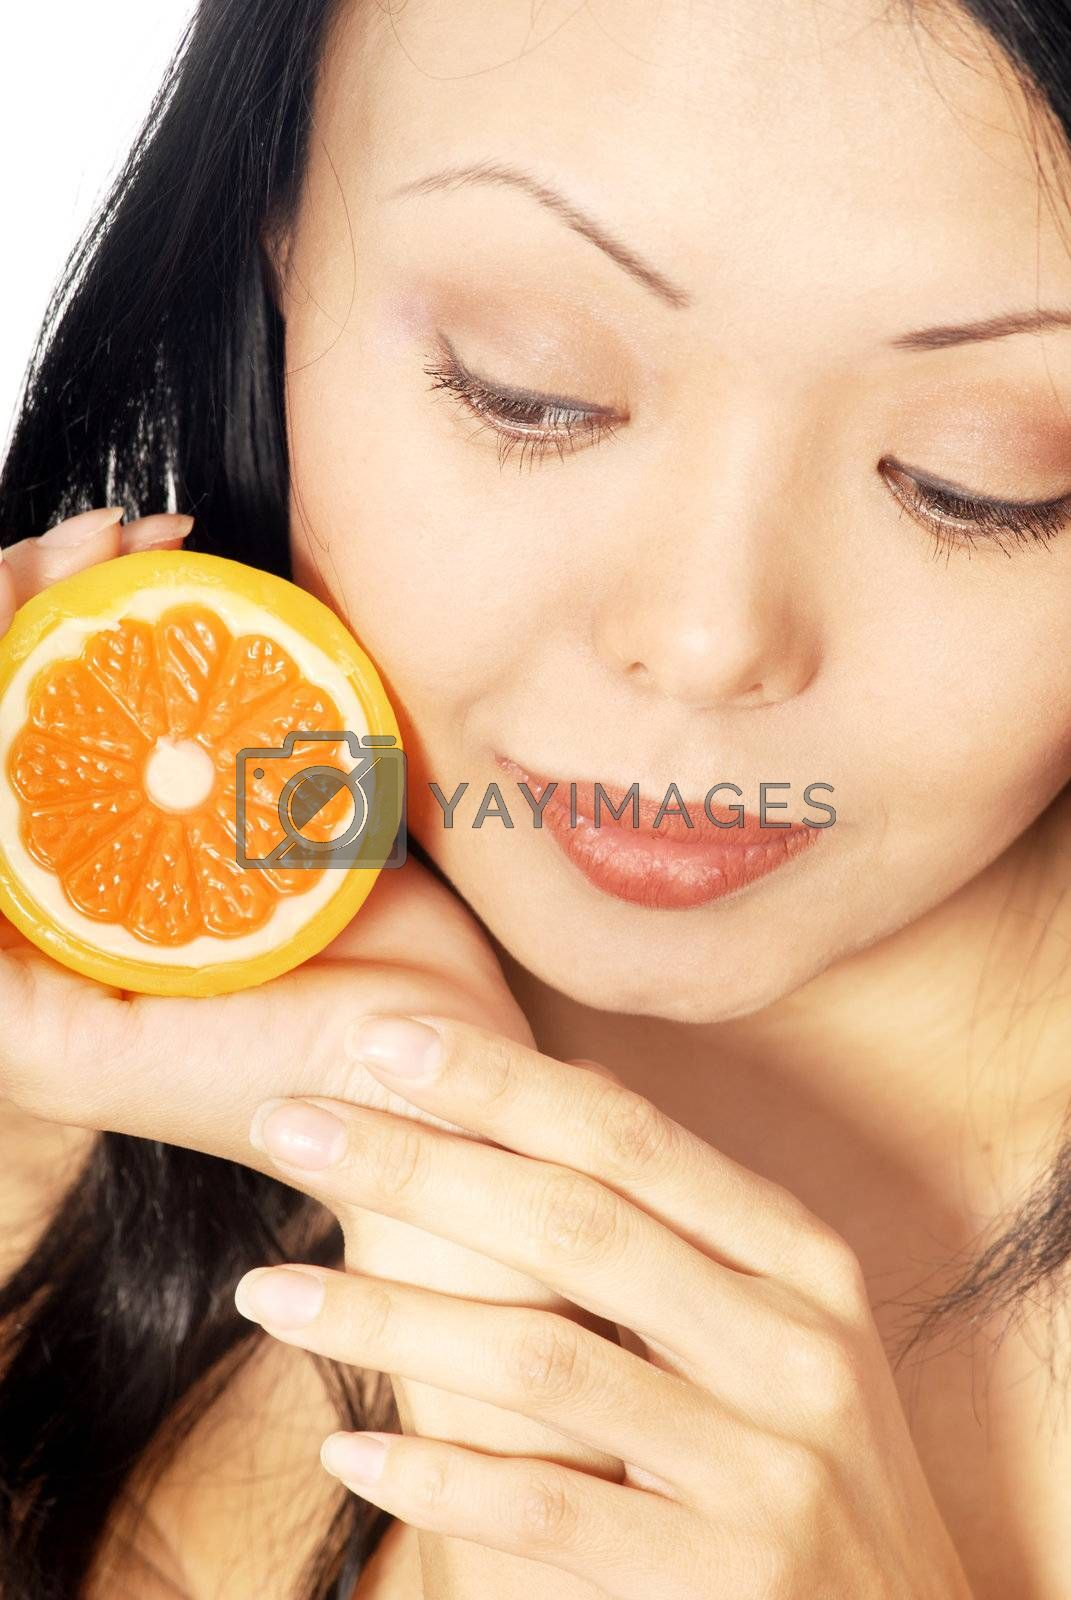 Close-up photo of pretty woman with fresh lemon